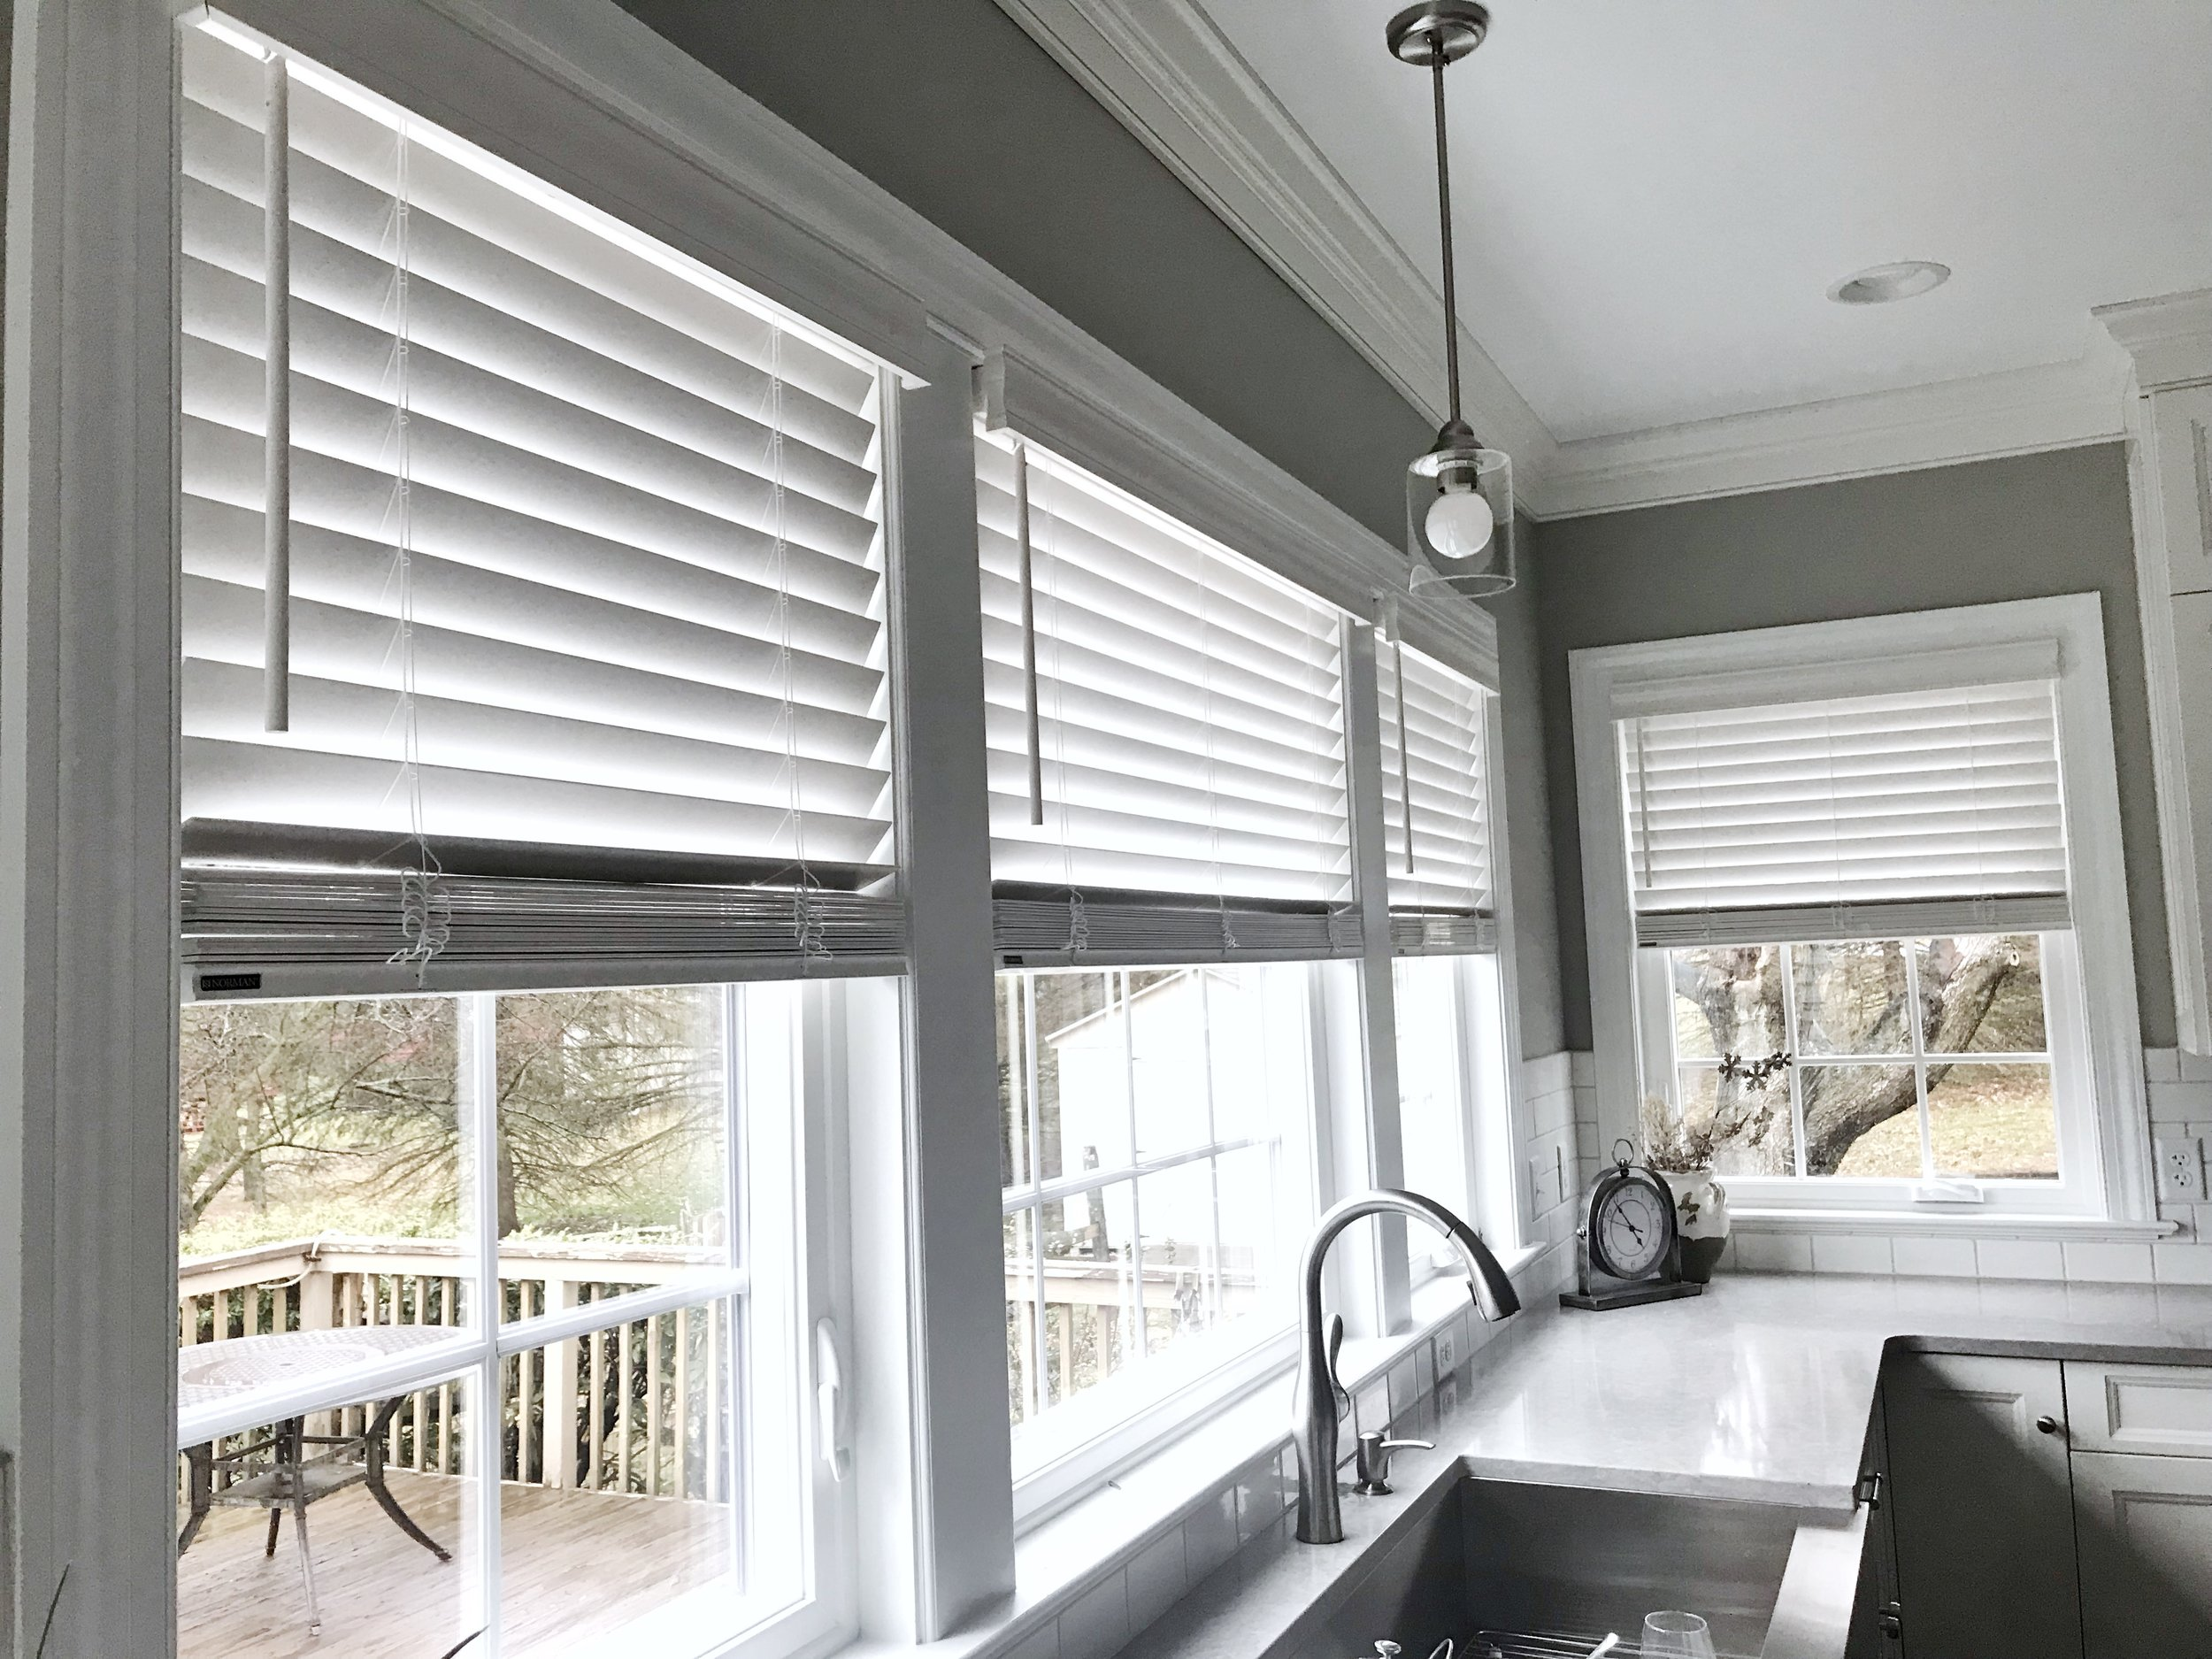 3rdGenBlinds custom white window blinds in kitchen